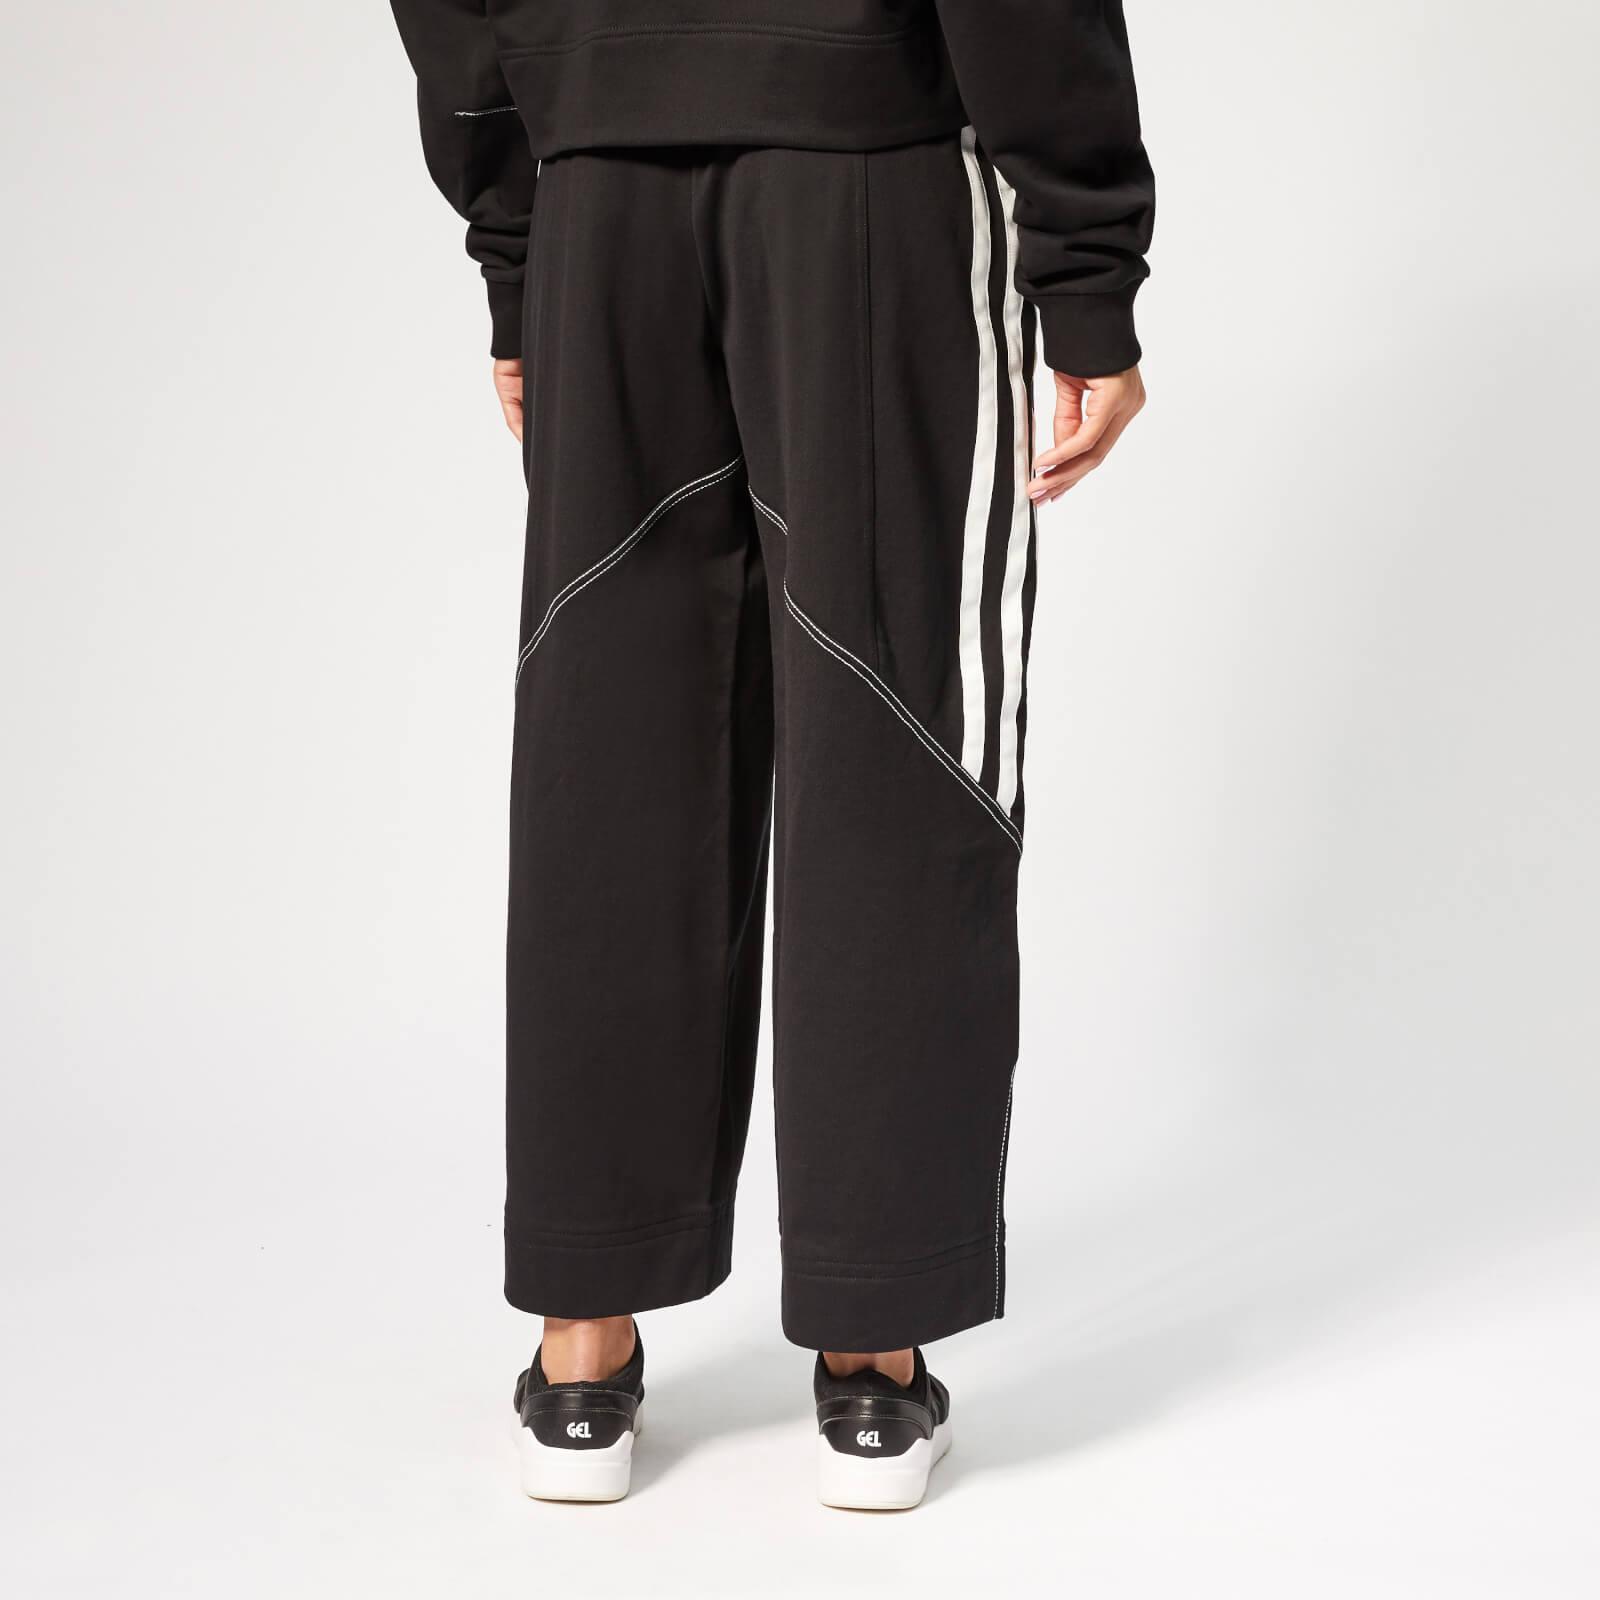 2819862c5ef44 Y-3 - Black 3 4 Stripe Wide Leg Pants - Lyst. View fullscreen